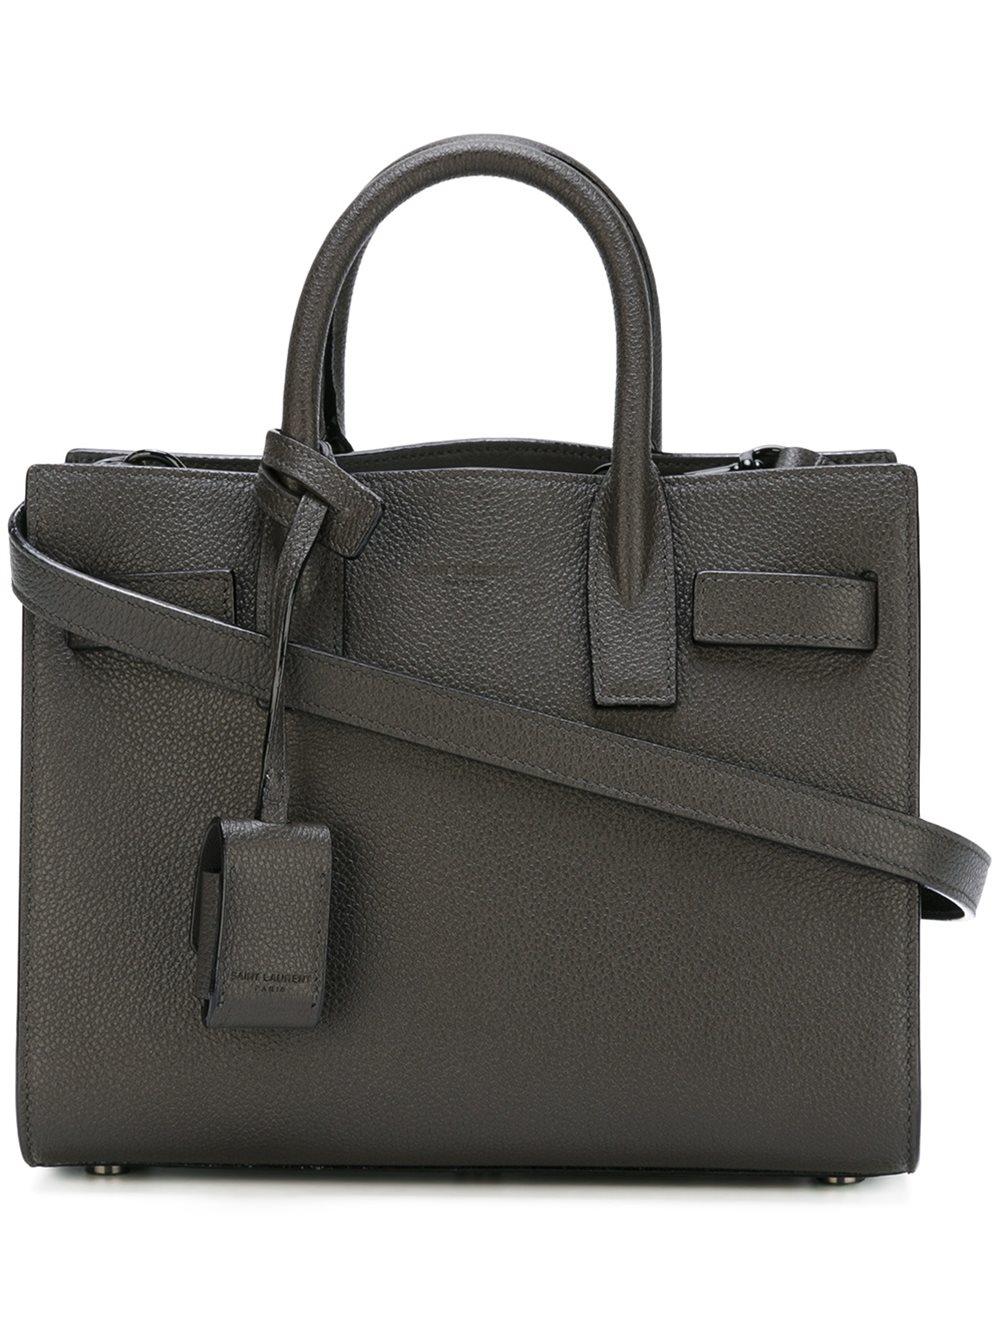 lyst saint laurent nano 39 sac de jour 39 tote bag in gray. Black Bedroom Furniture Sets. Home Design Ideas